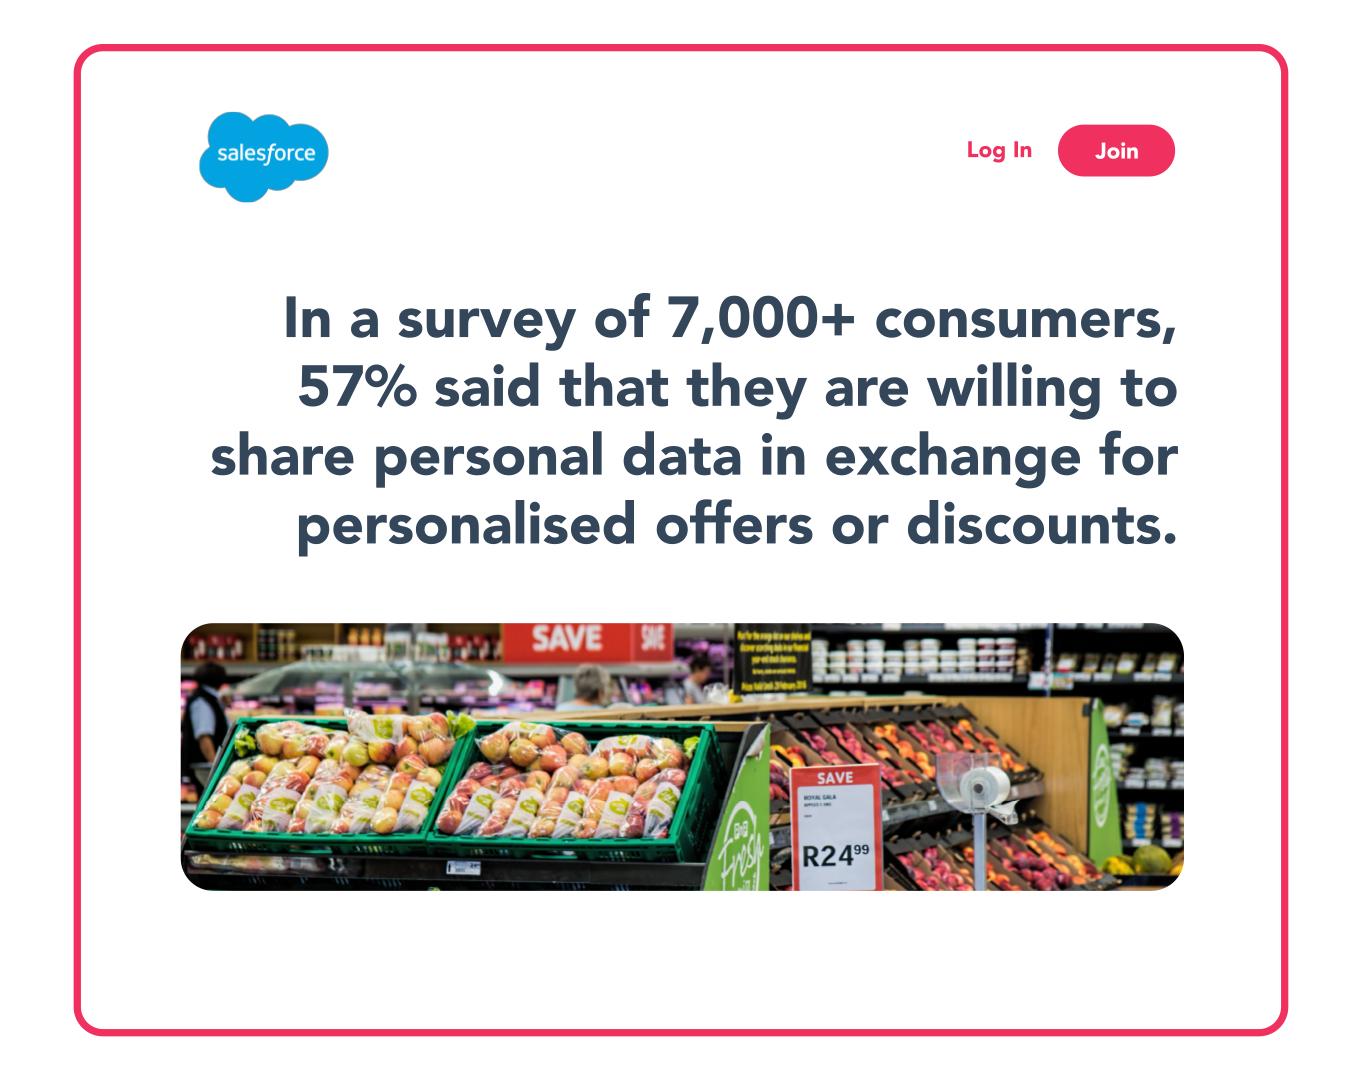 salesforce Market Segmentation Demographic Segmentation Geographic Segmentation Behavioral Segmentation  Psychographic Segmentation Marketing Strategy Analytics Google Analytics Social Media Analytics